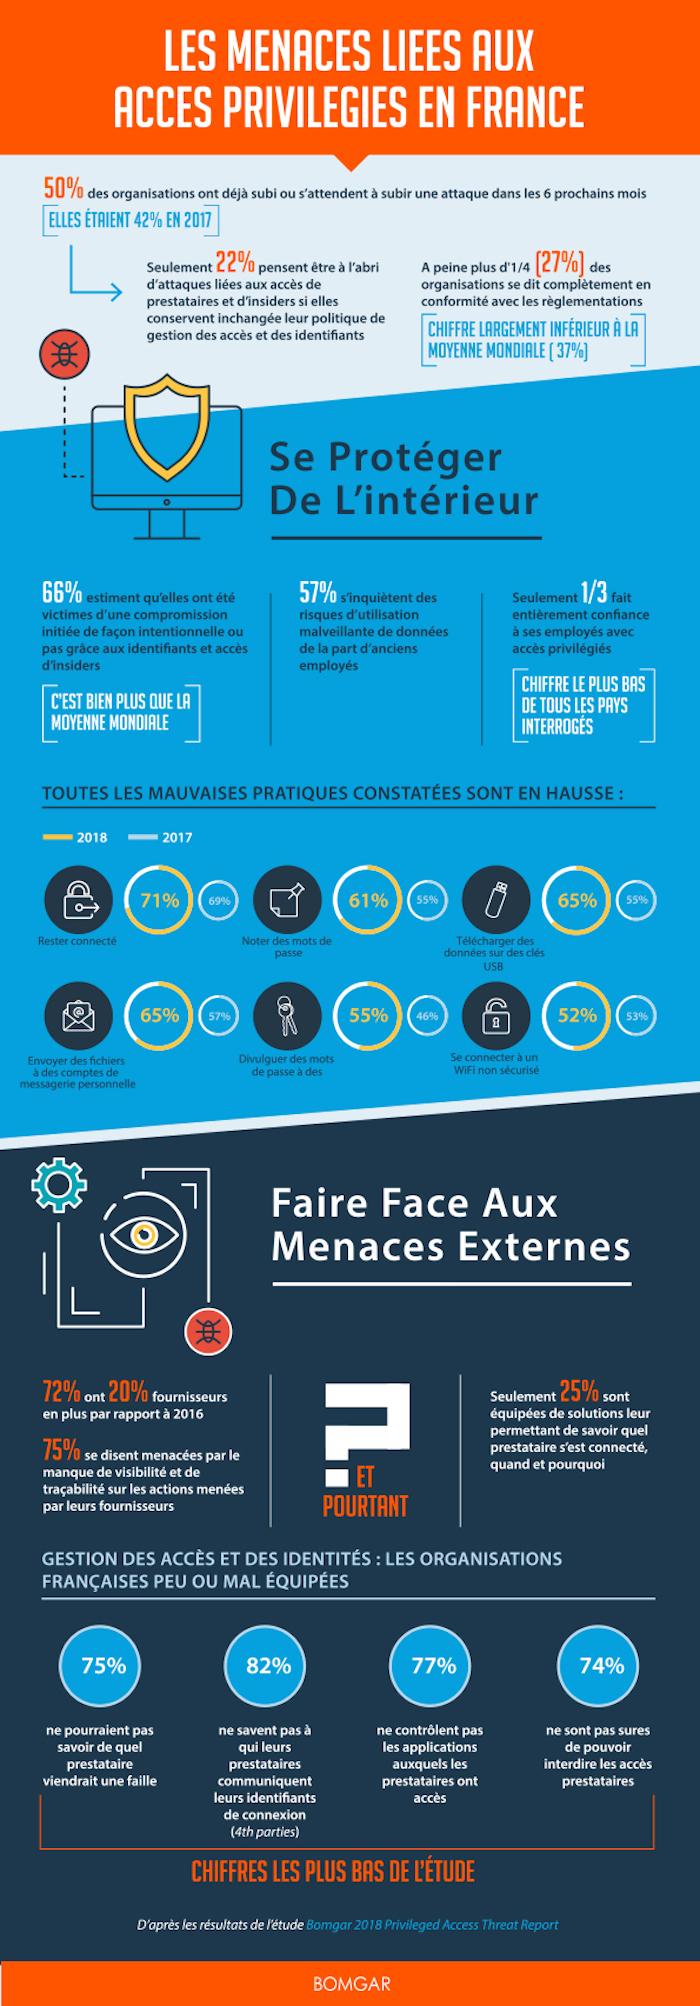 PATR-Key-figures-FRENCH